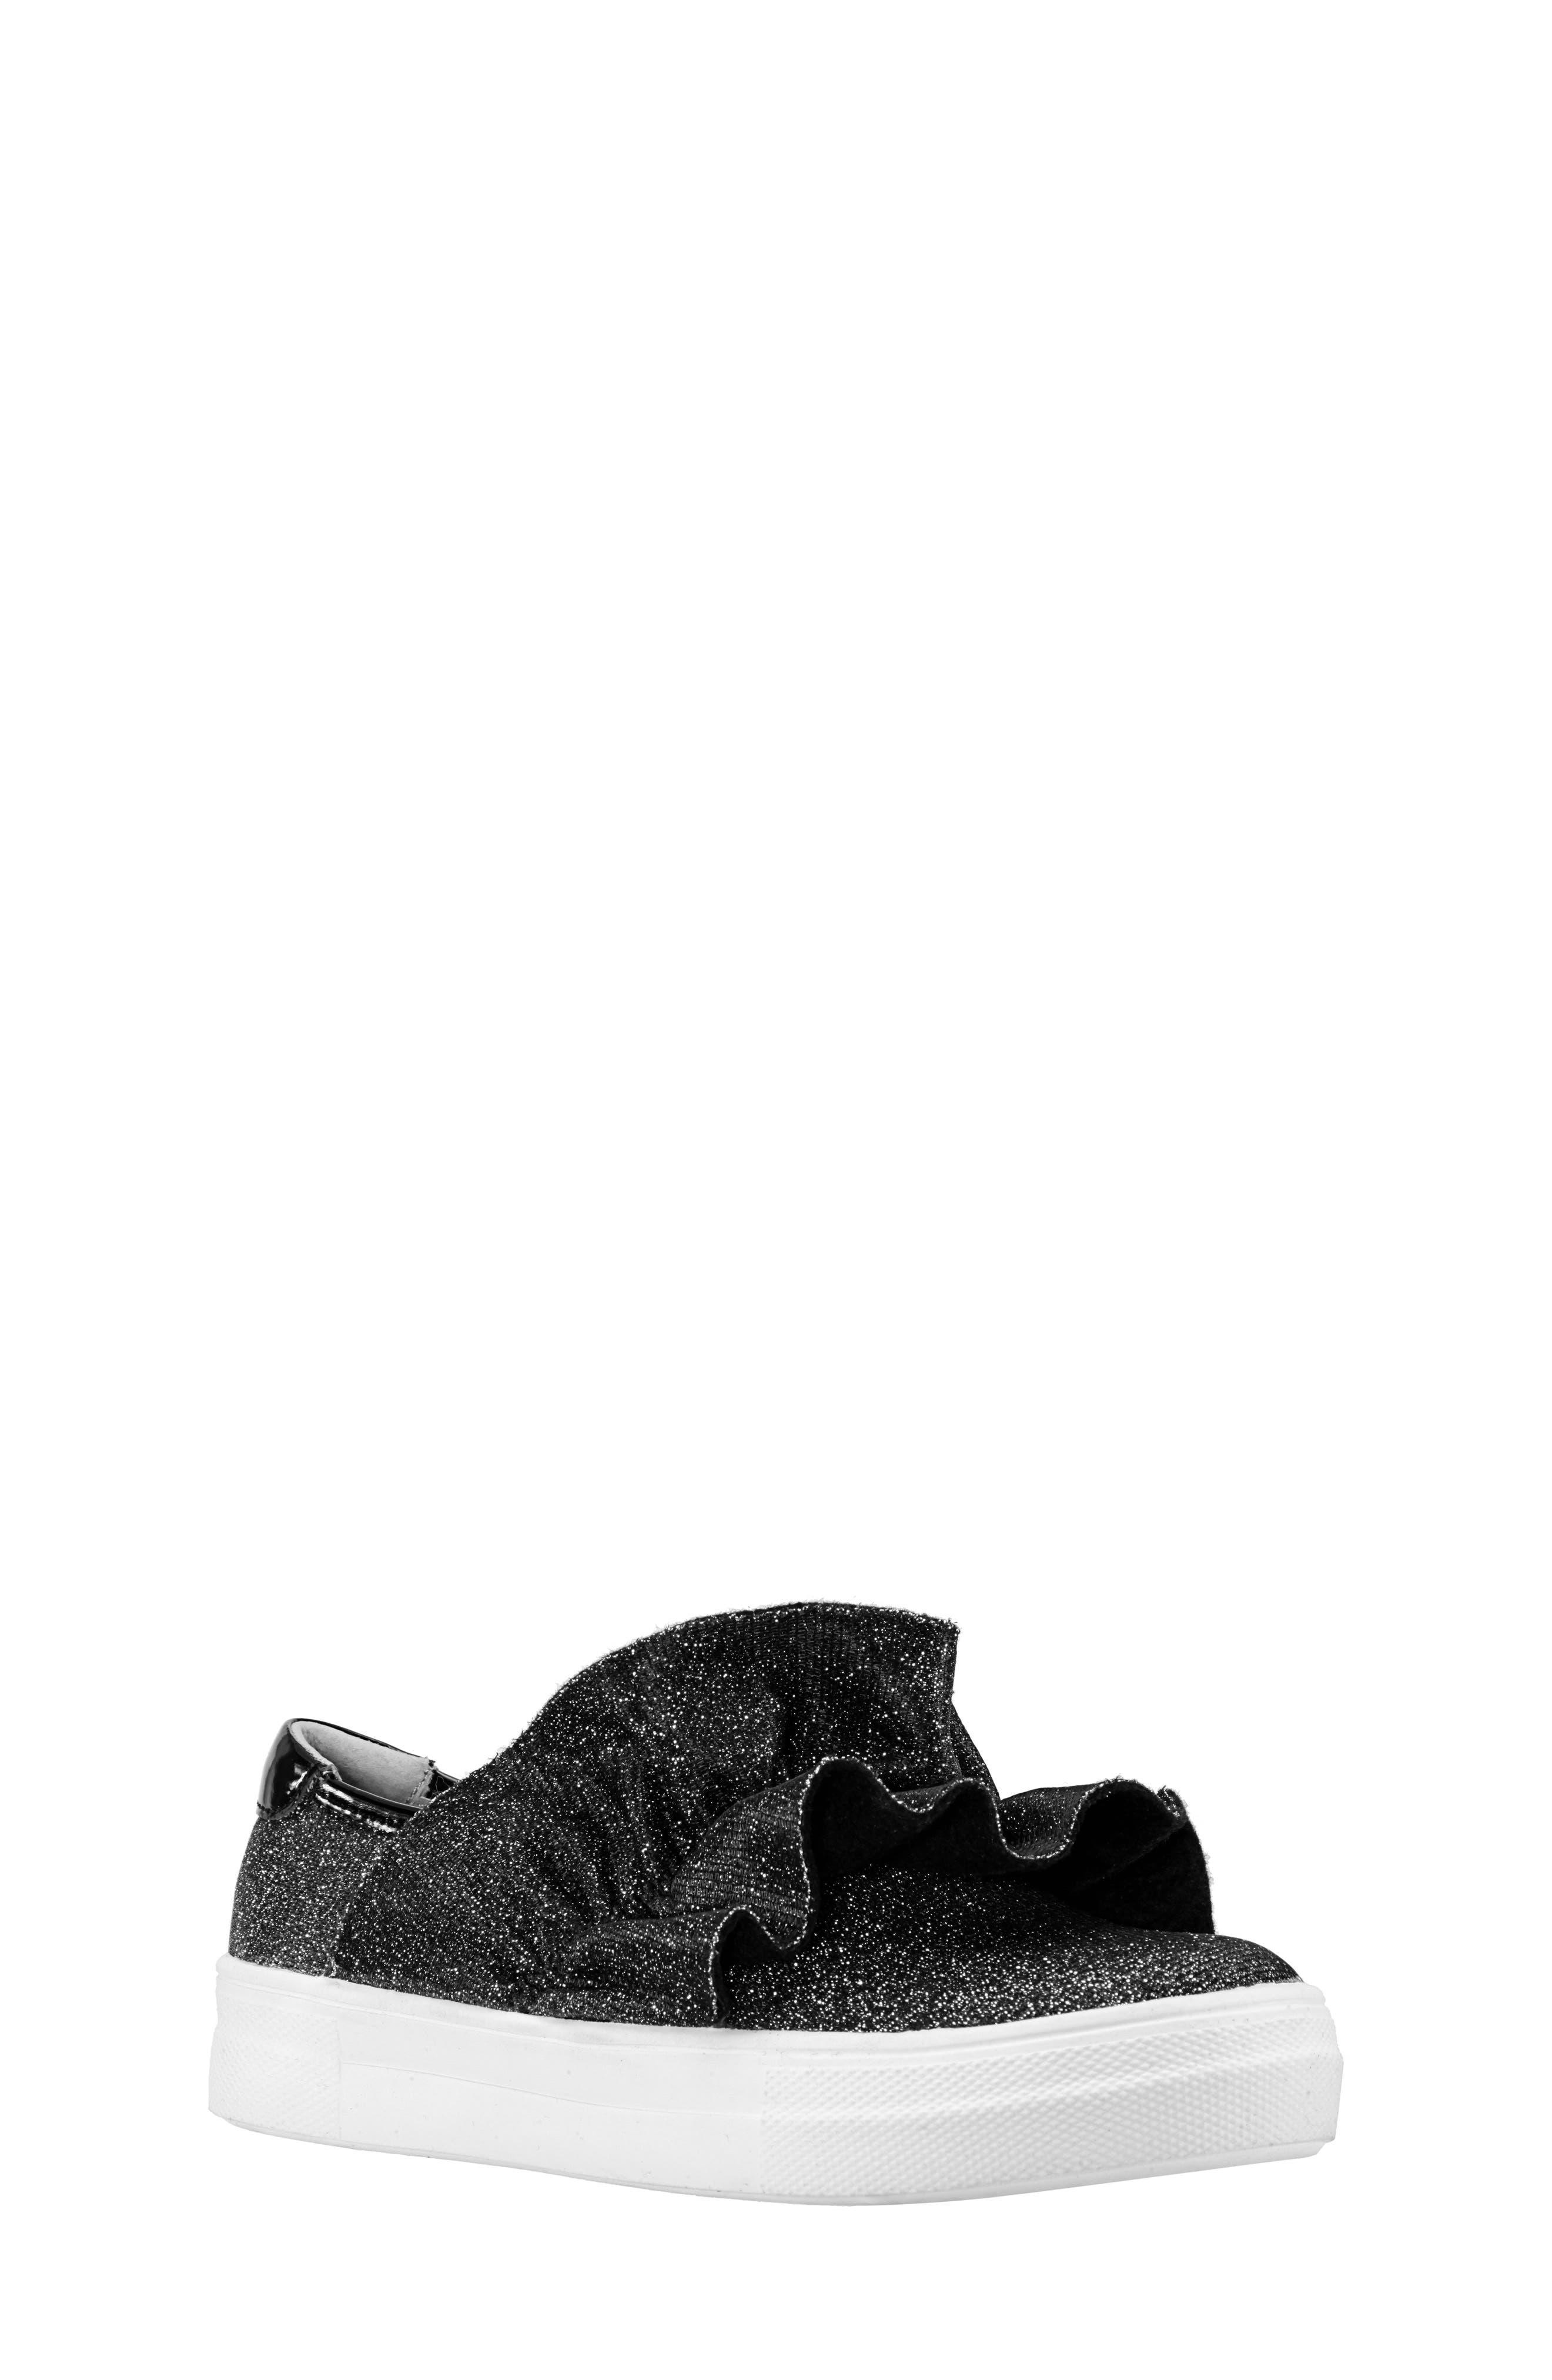 Ivani Slip-On Sneaker,                         Main,                         color, 010